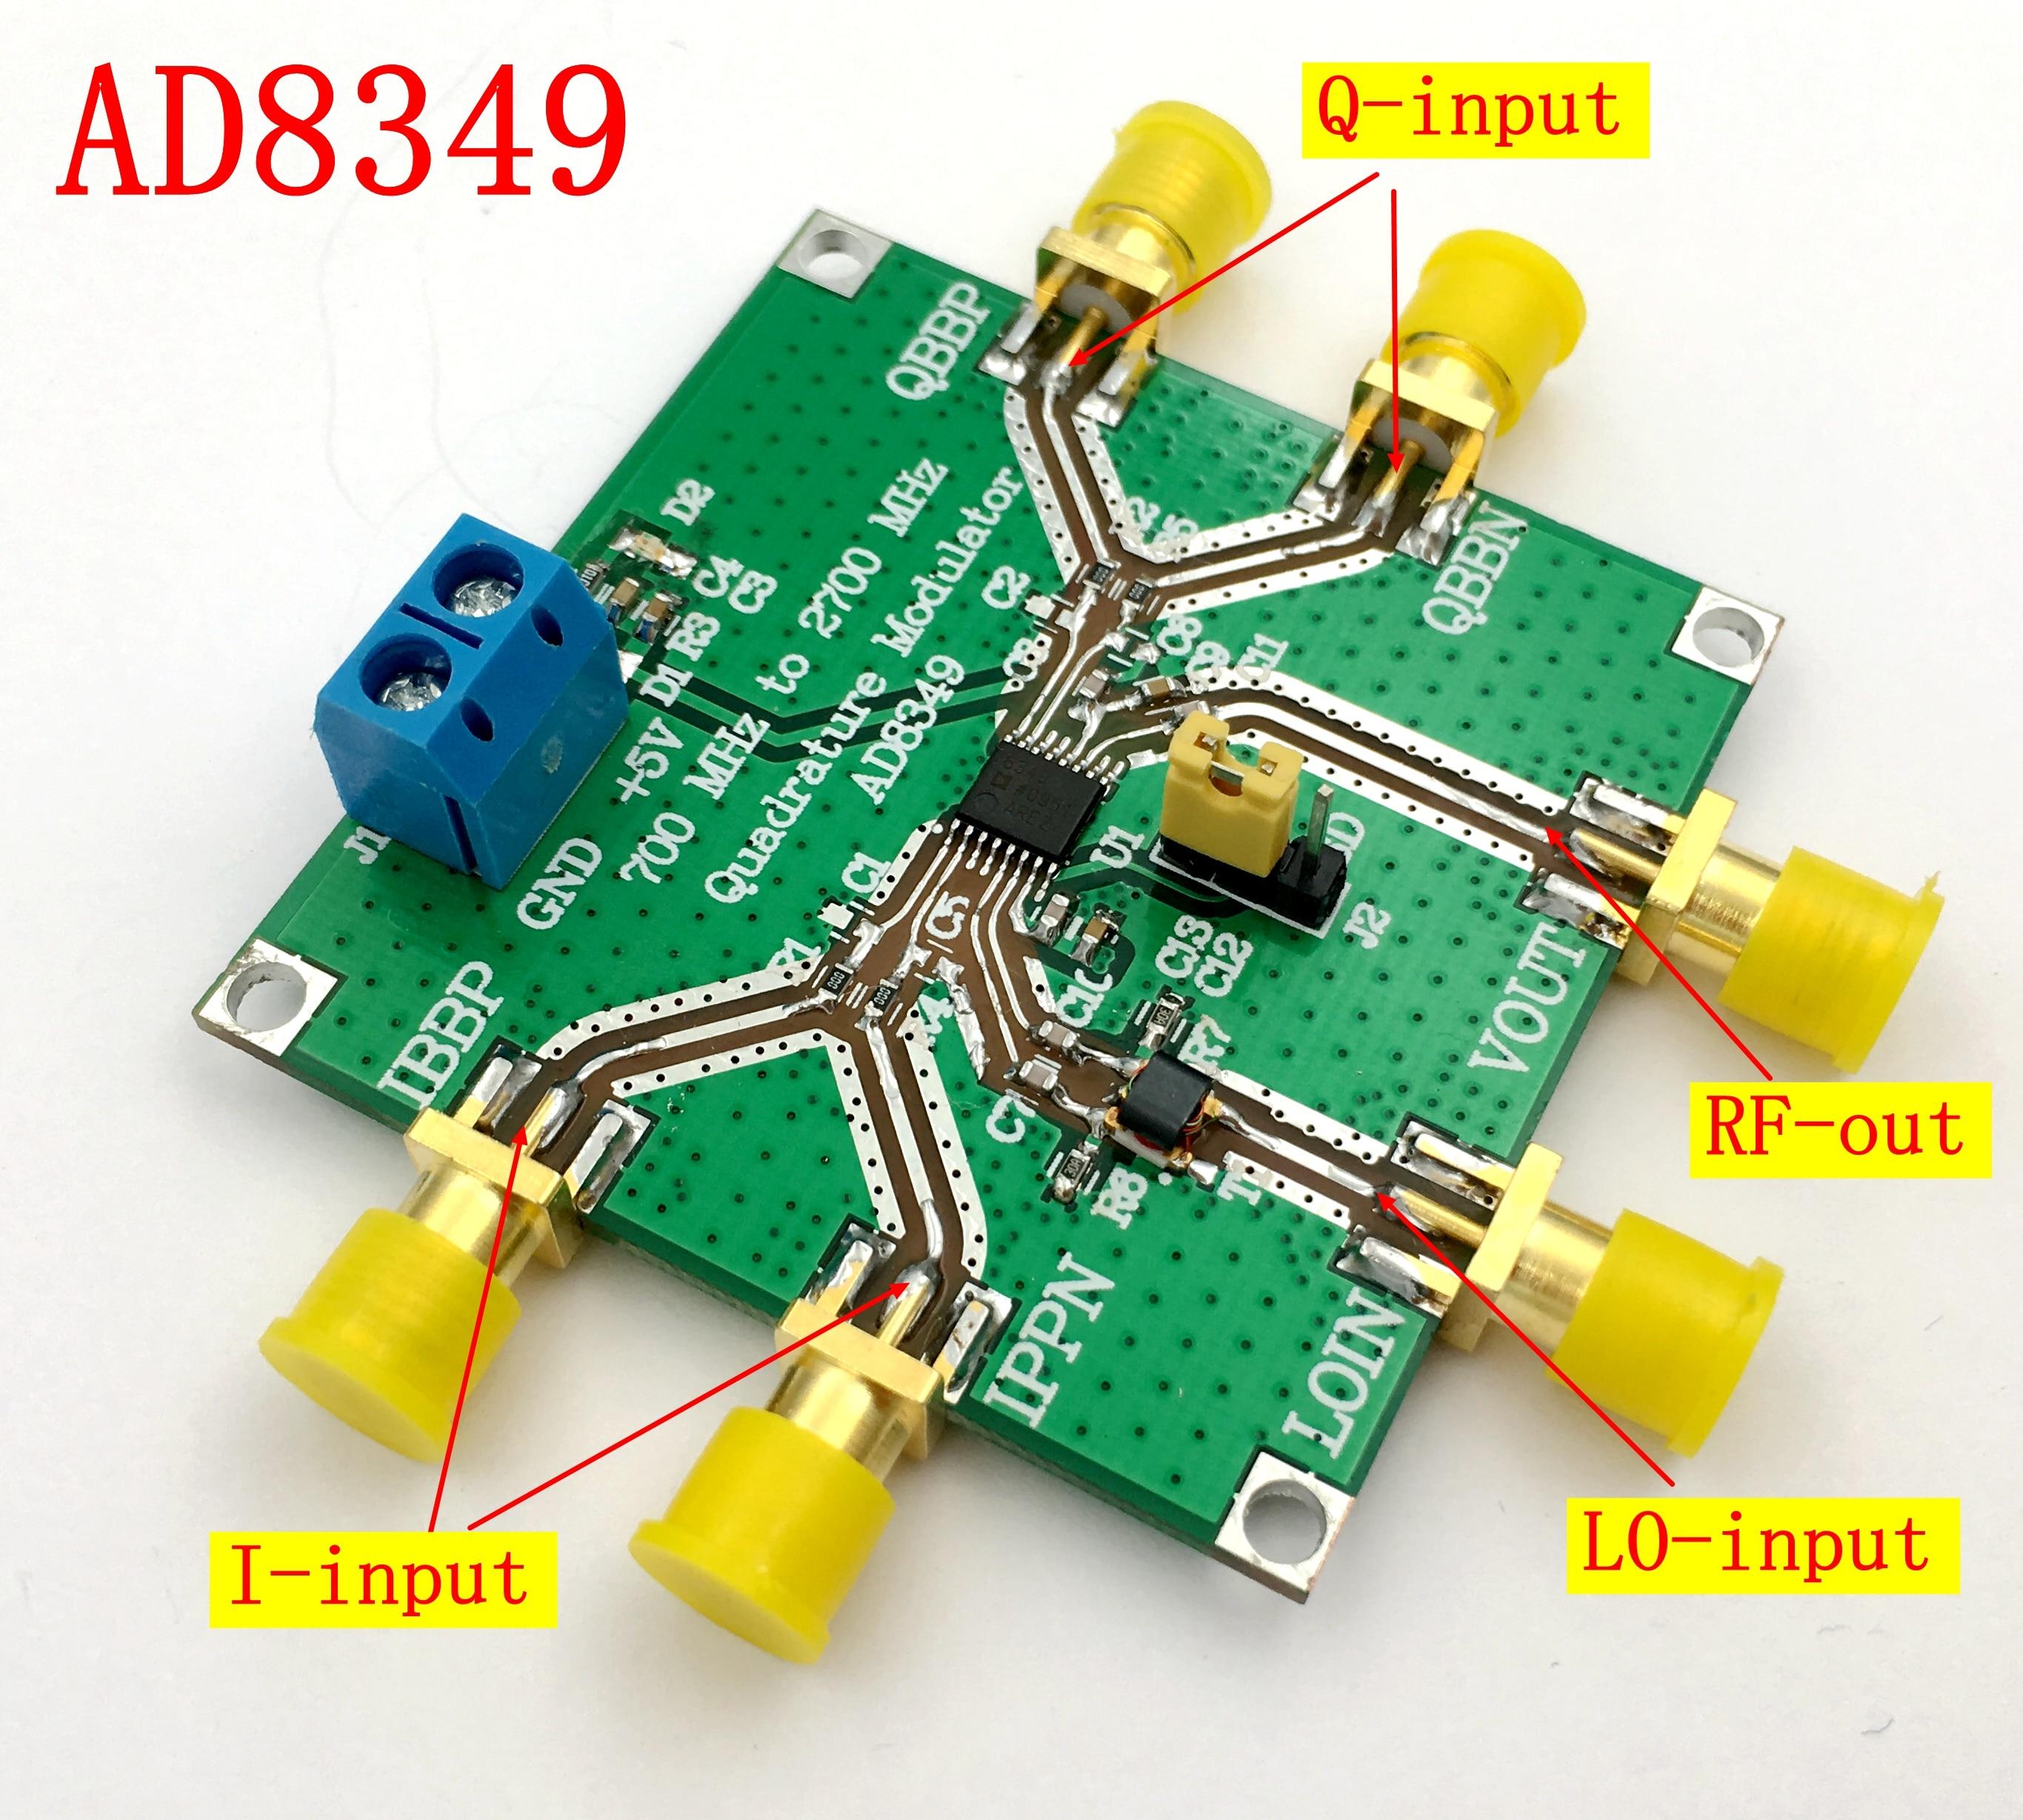 AD8349 Quadrature Modulation Module 700 MHz to 2.7 GHz I Q Modem Series ModuleAD8349 Quadrature Modulation Module 700 MHz to 2.7 GHz I Q Modem Series Module